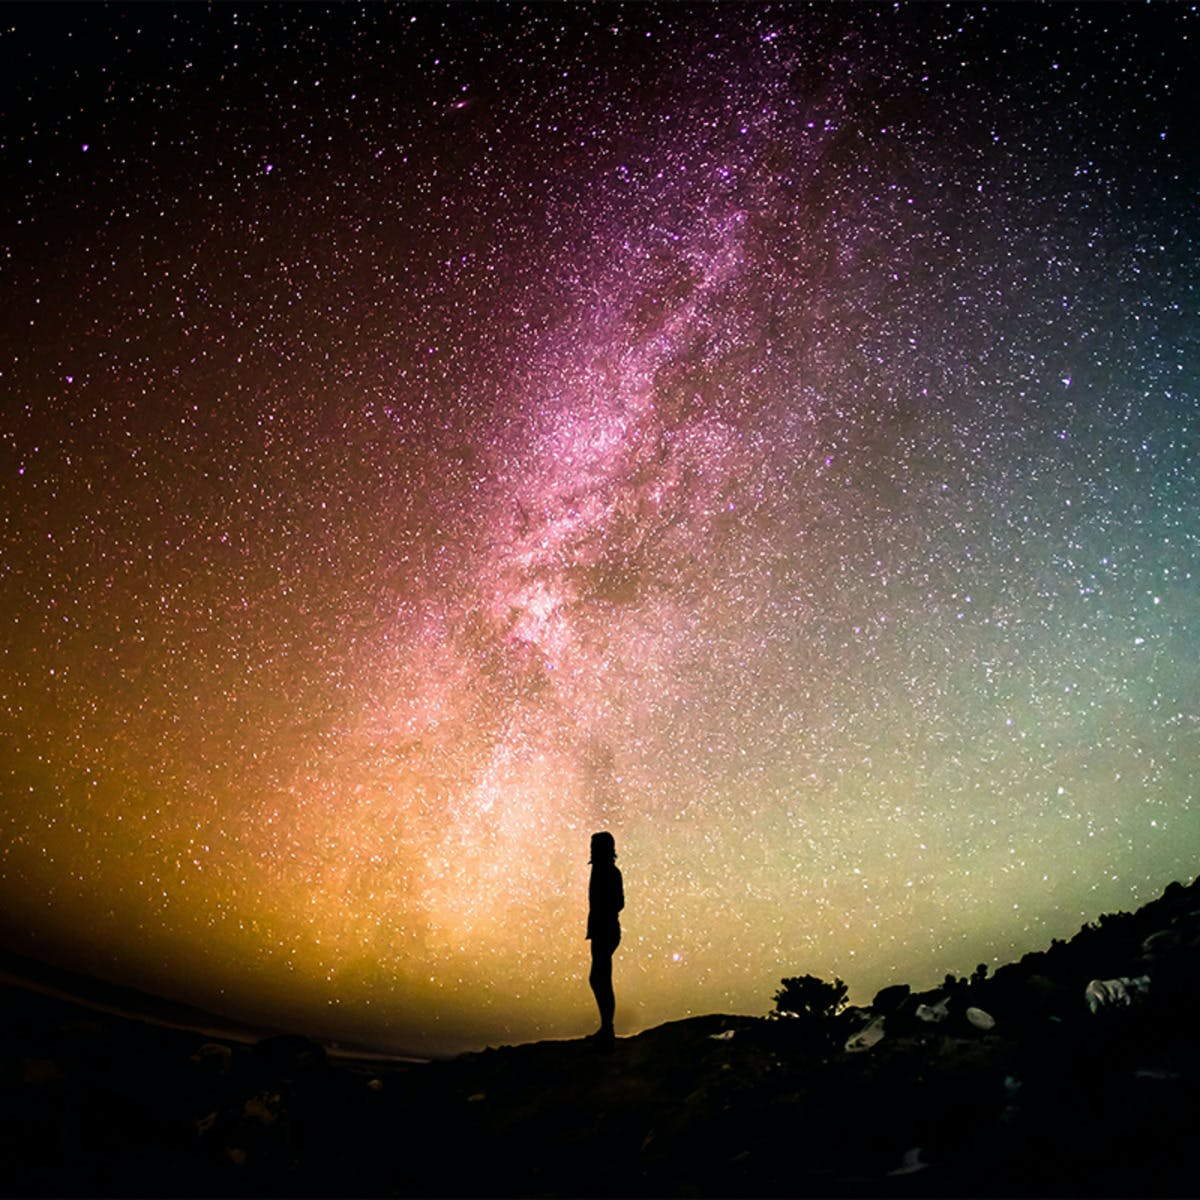 Astrobiology: Exploring Other Worlds